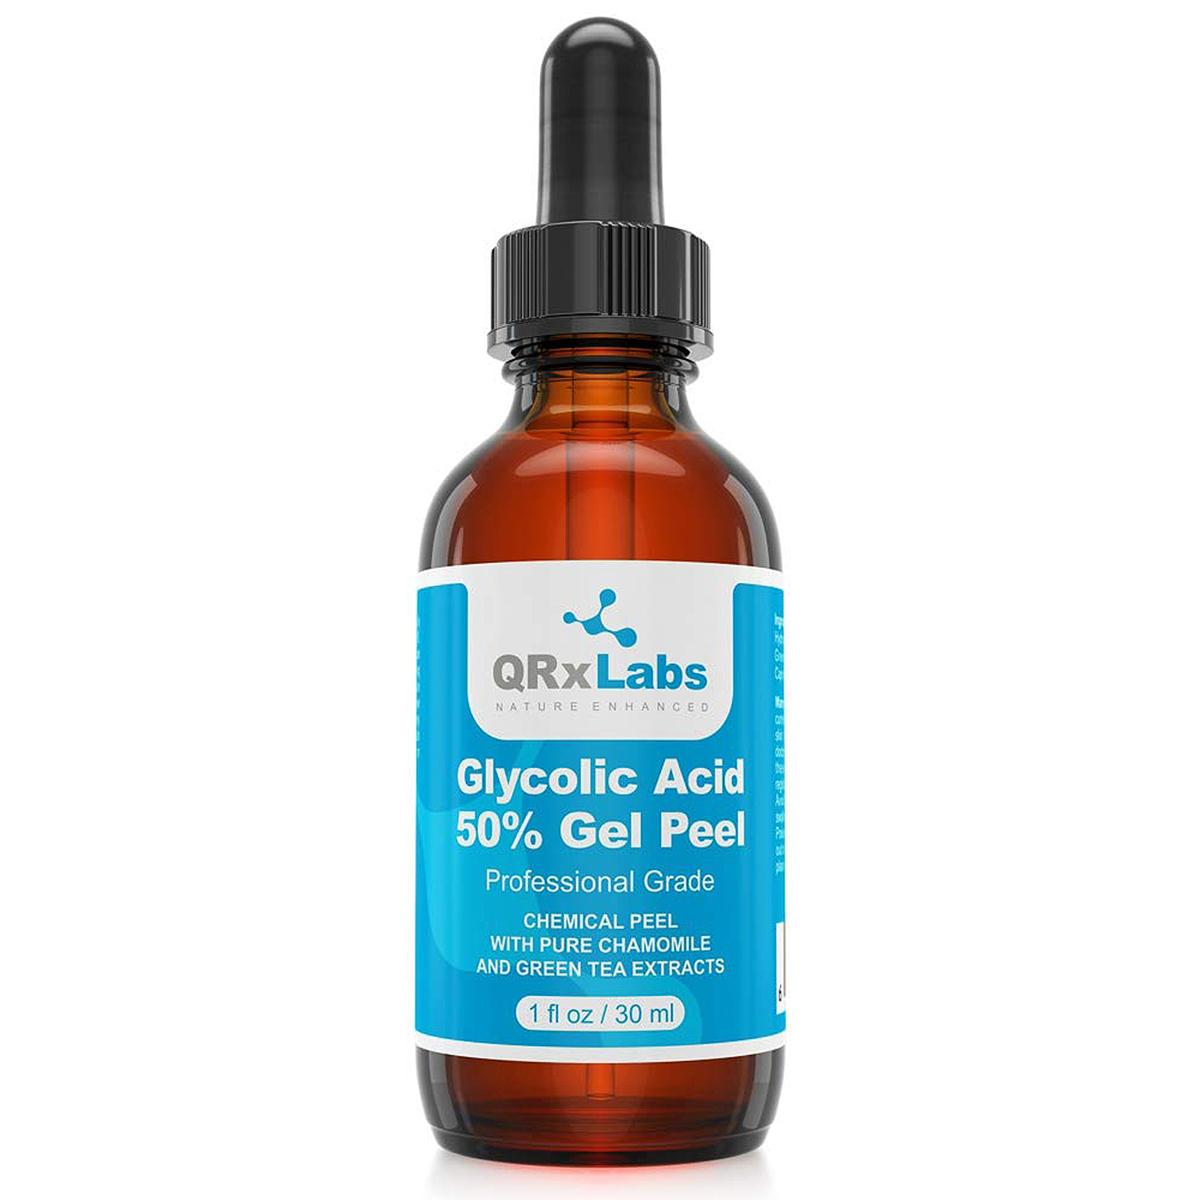 QRxLabs Glycolic Acid 50% Gel Peel